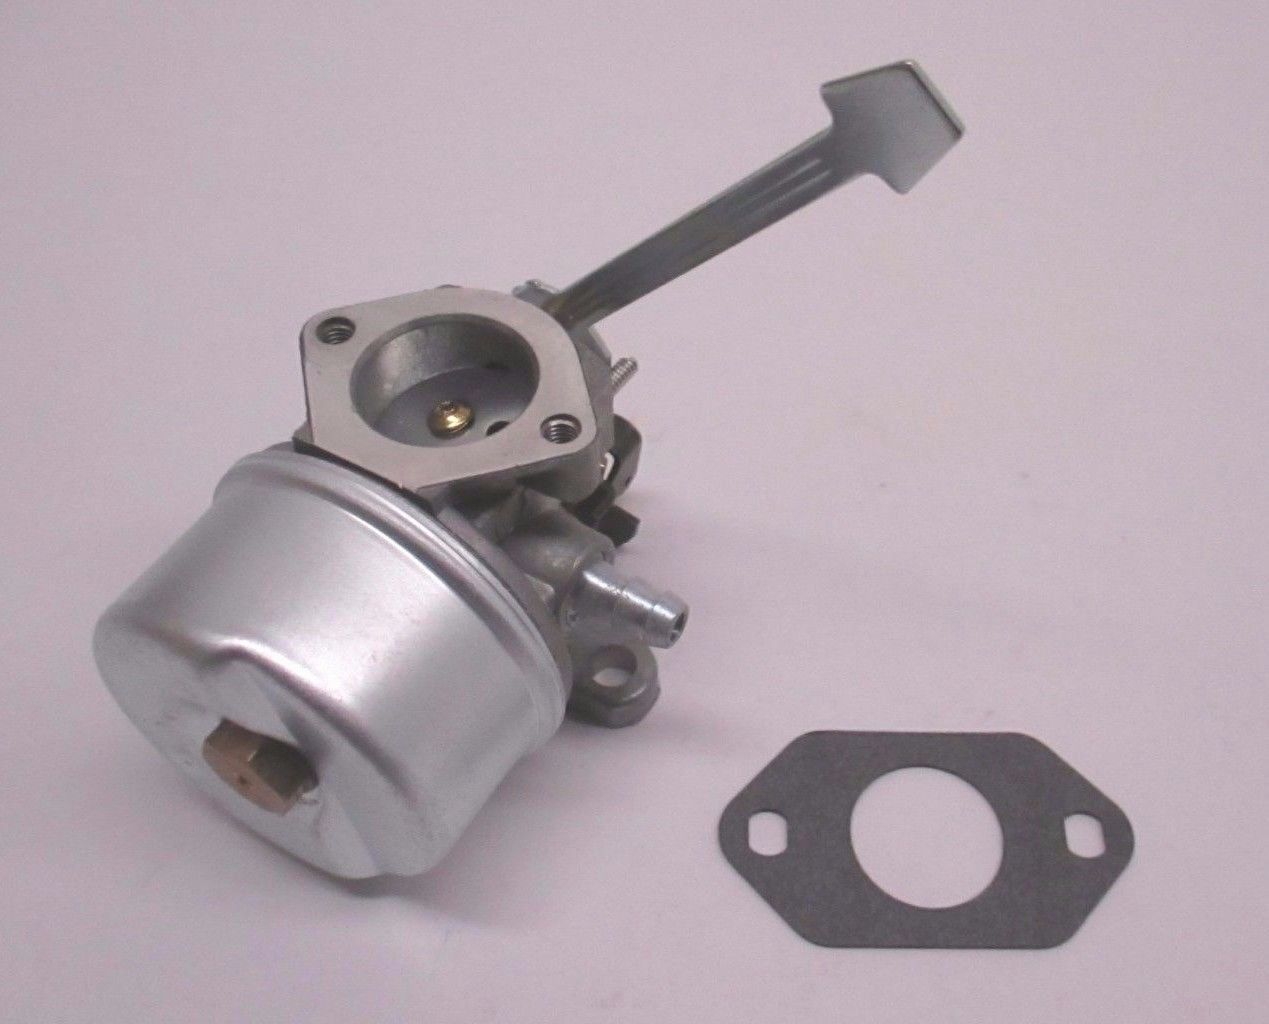 Carburetor Fits Tecumseh HSK600 HSK635 TH098SA Snapper Craftsman Snowblower Toro